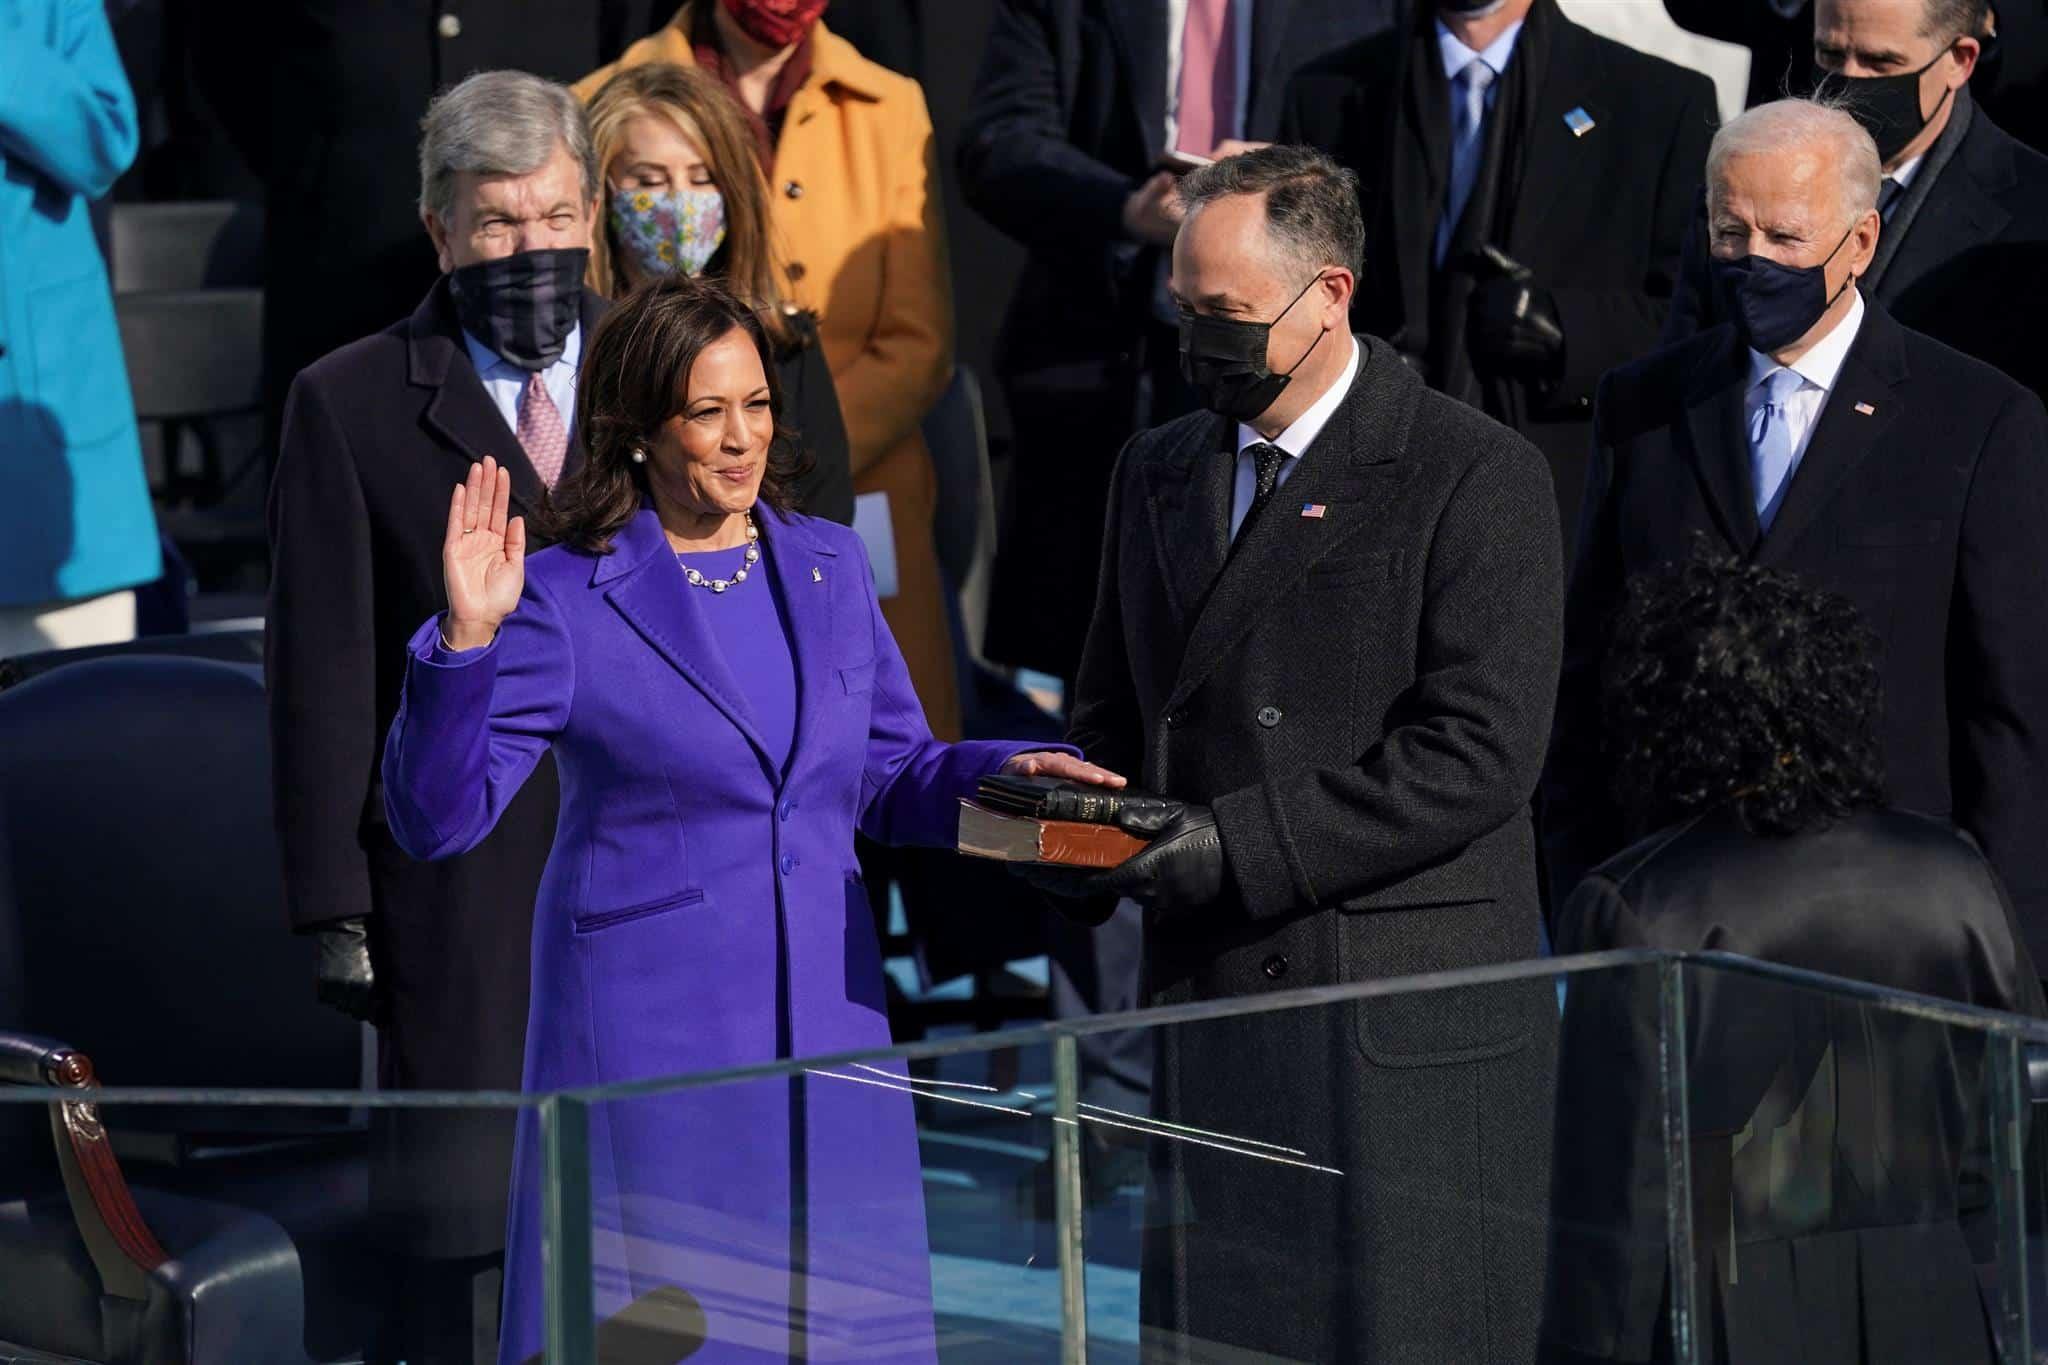 Photo of Kamala Harris being sworn in as vice president